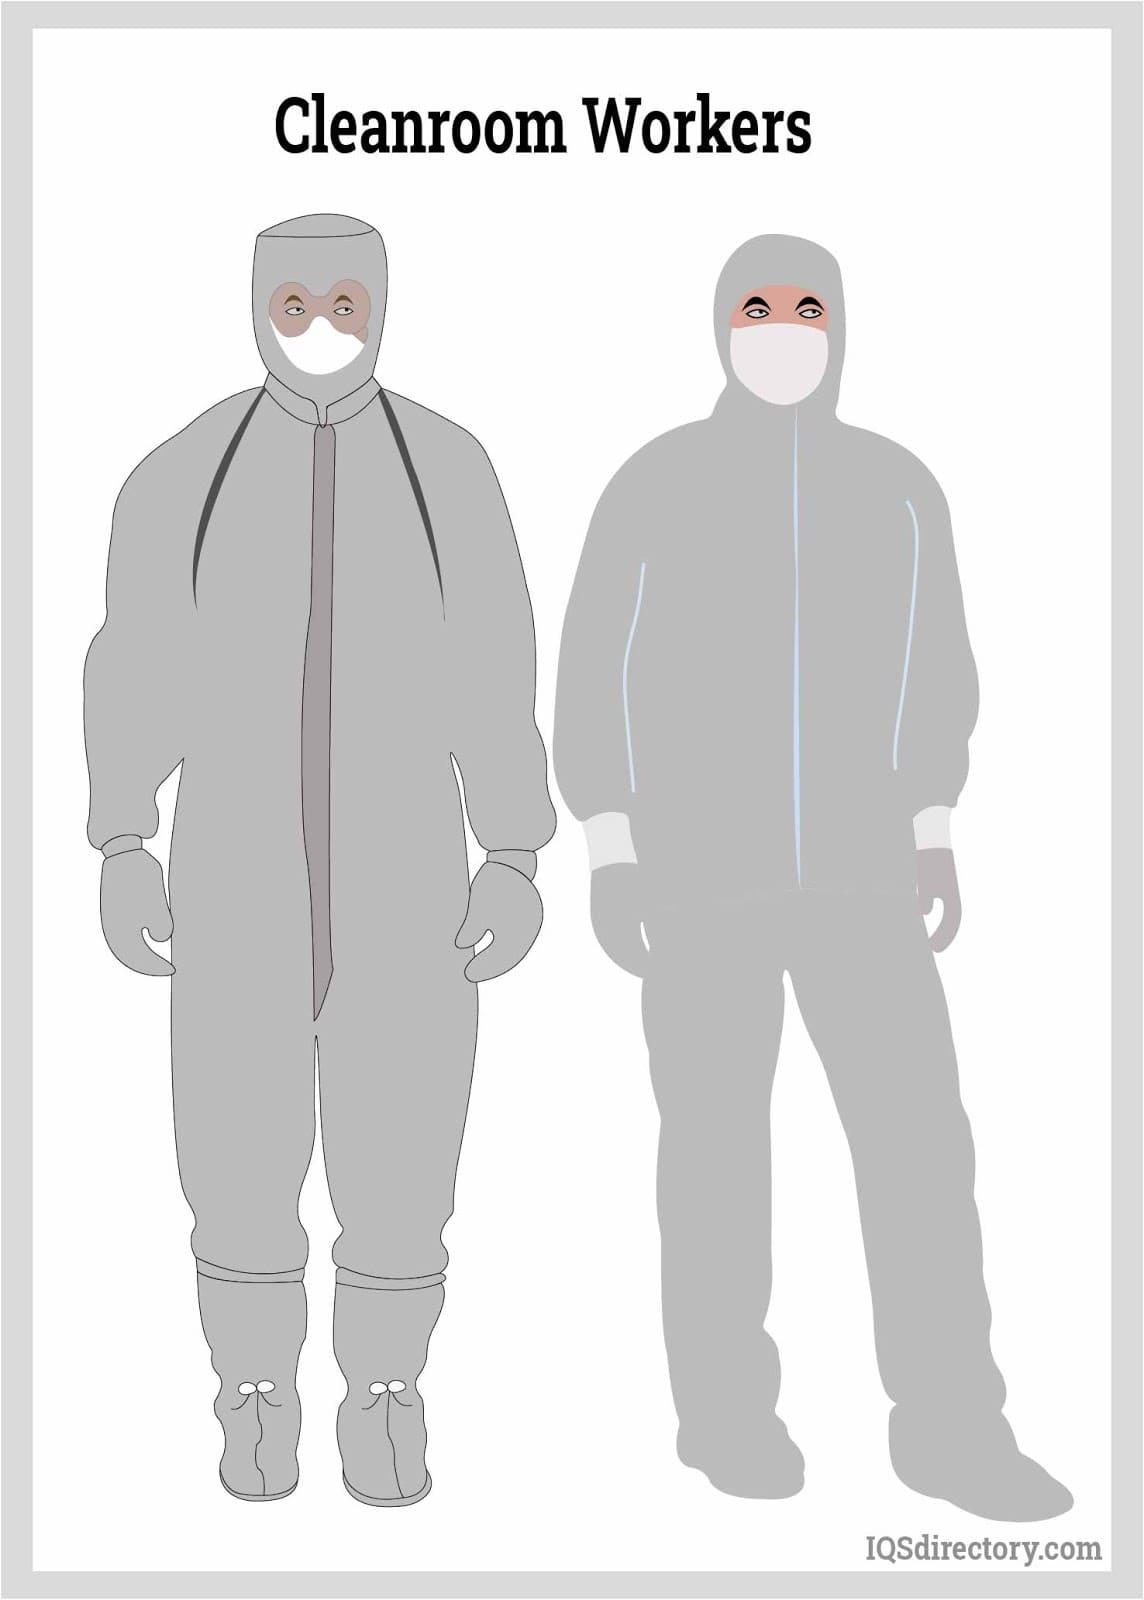 Cleanroom Workers